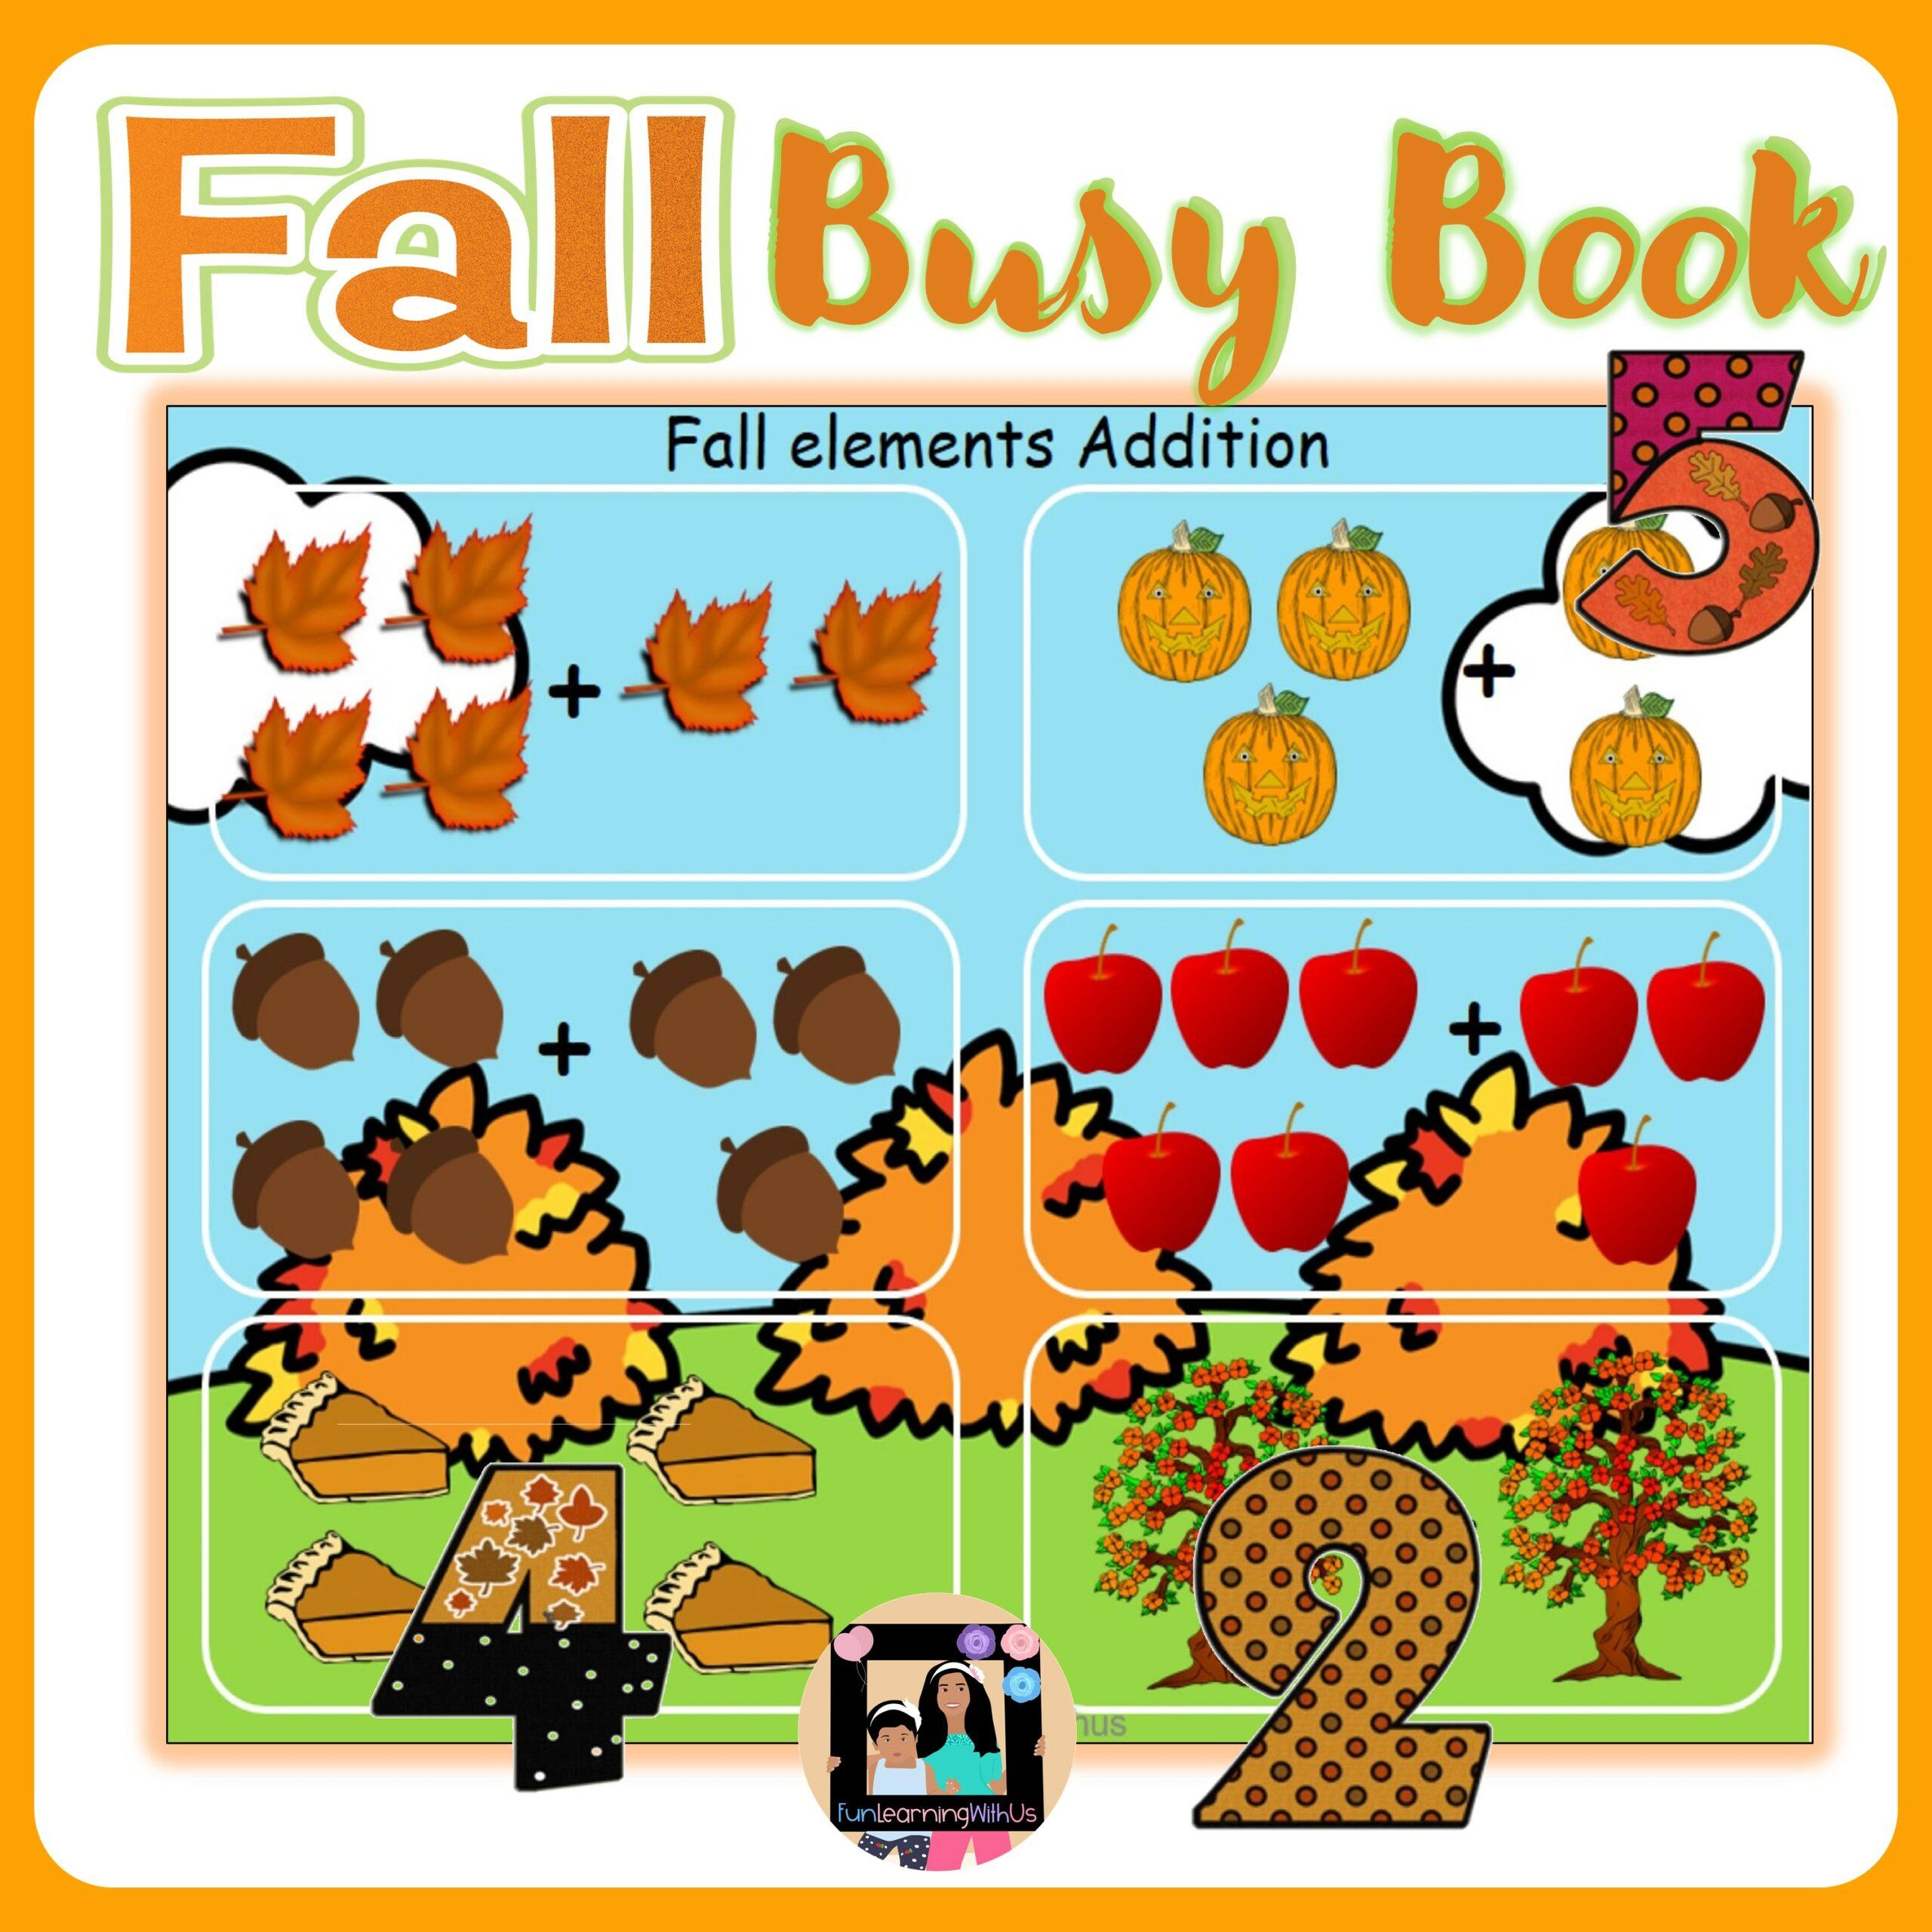 Fall Busy Book for Preschool - Kindergarten|Seasons